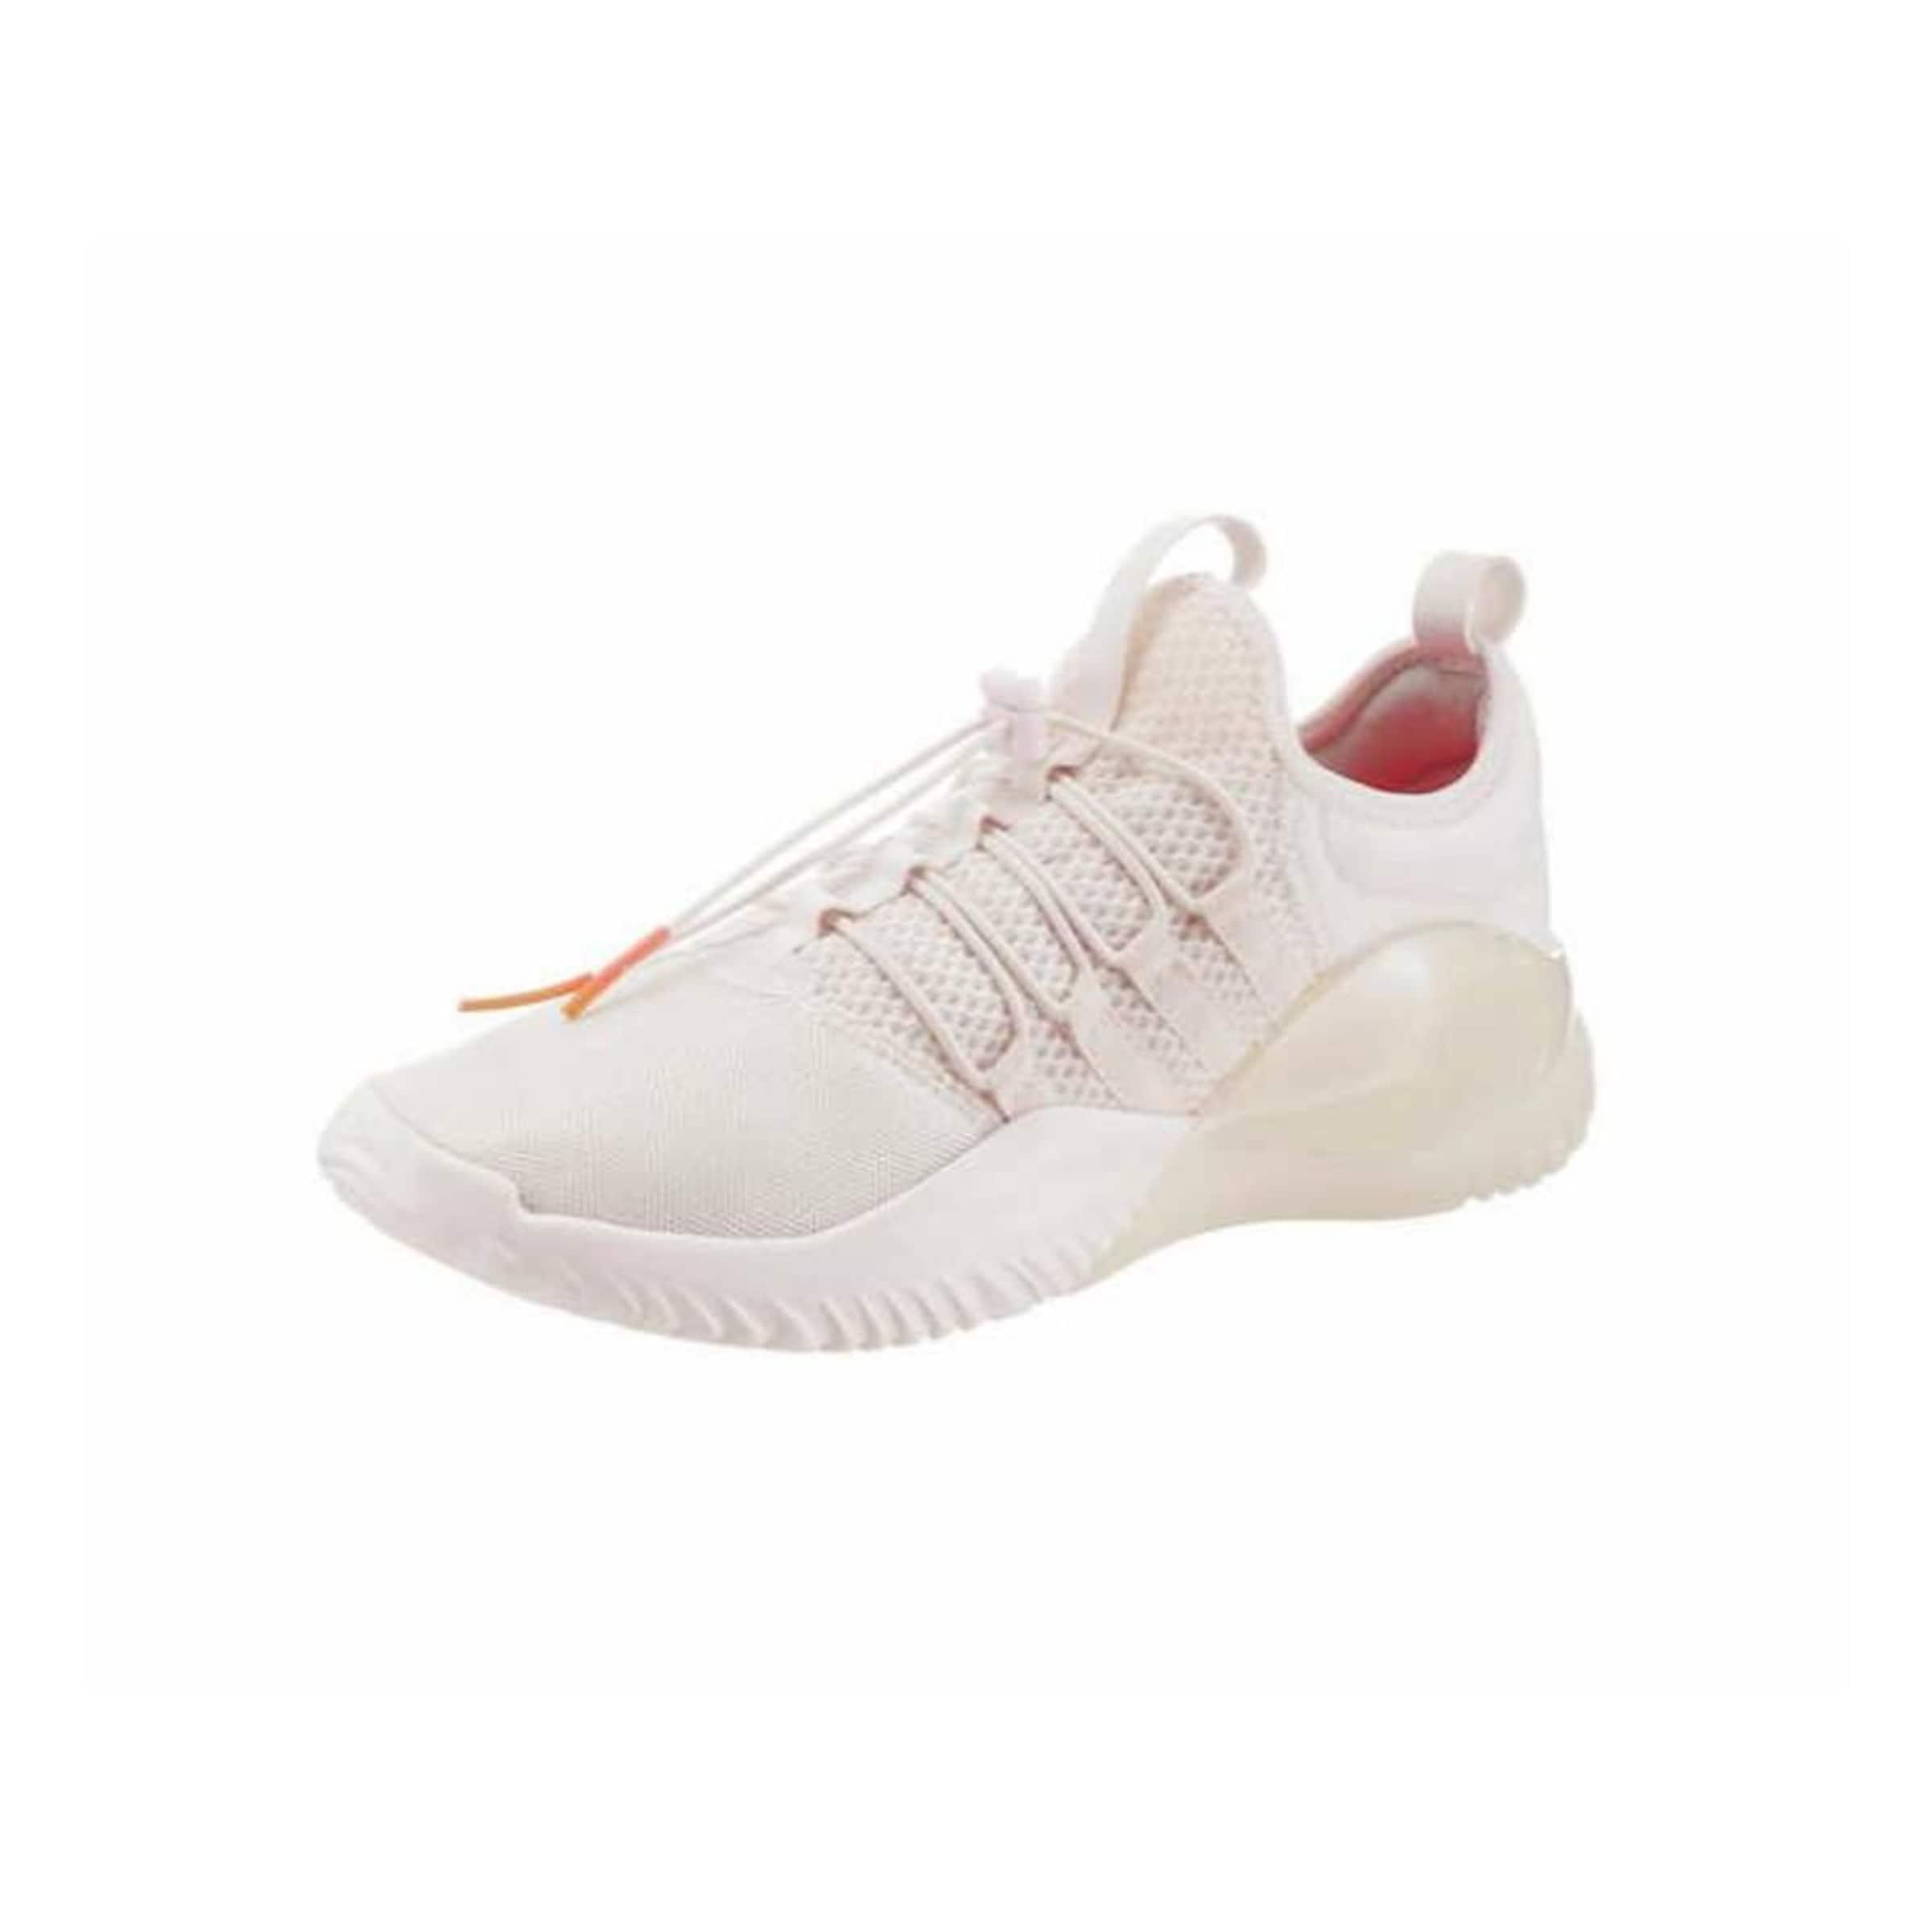 Tamaris Sneakers In In Sneakers Offwhite Tamaris NPOZ0wX8kn